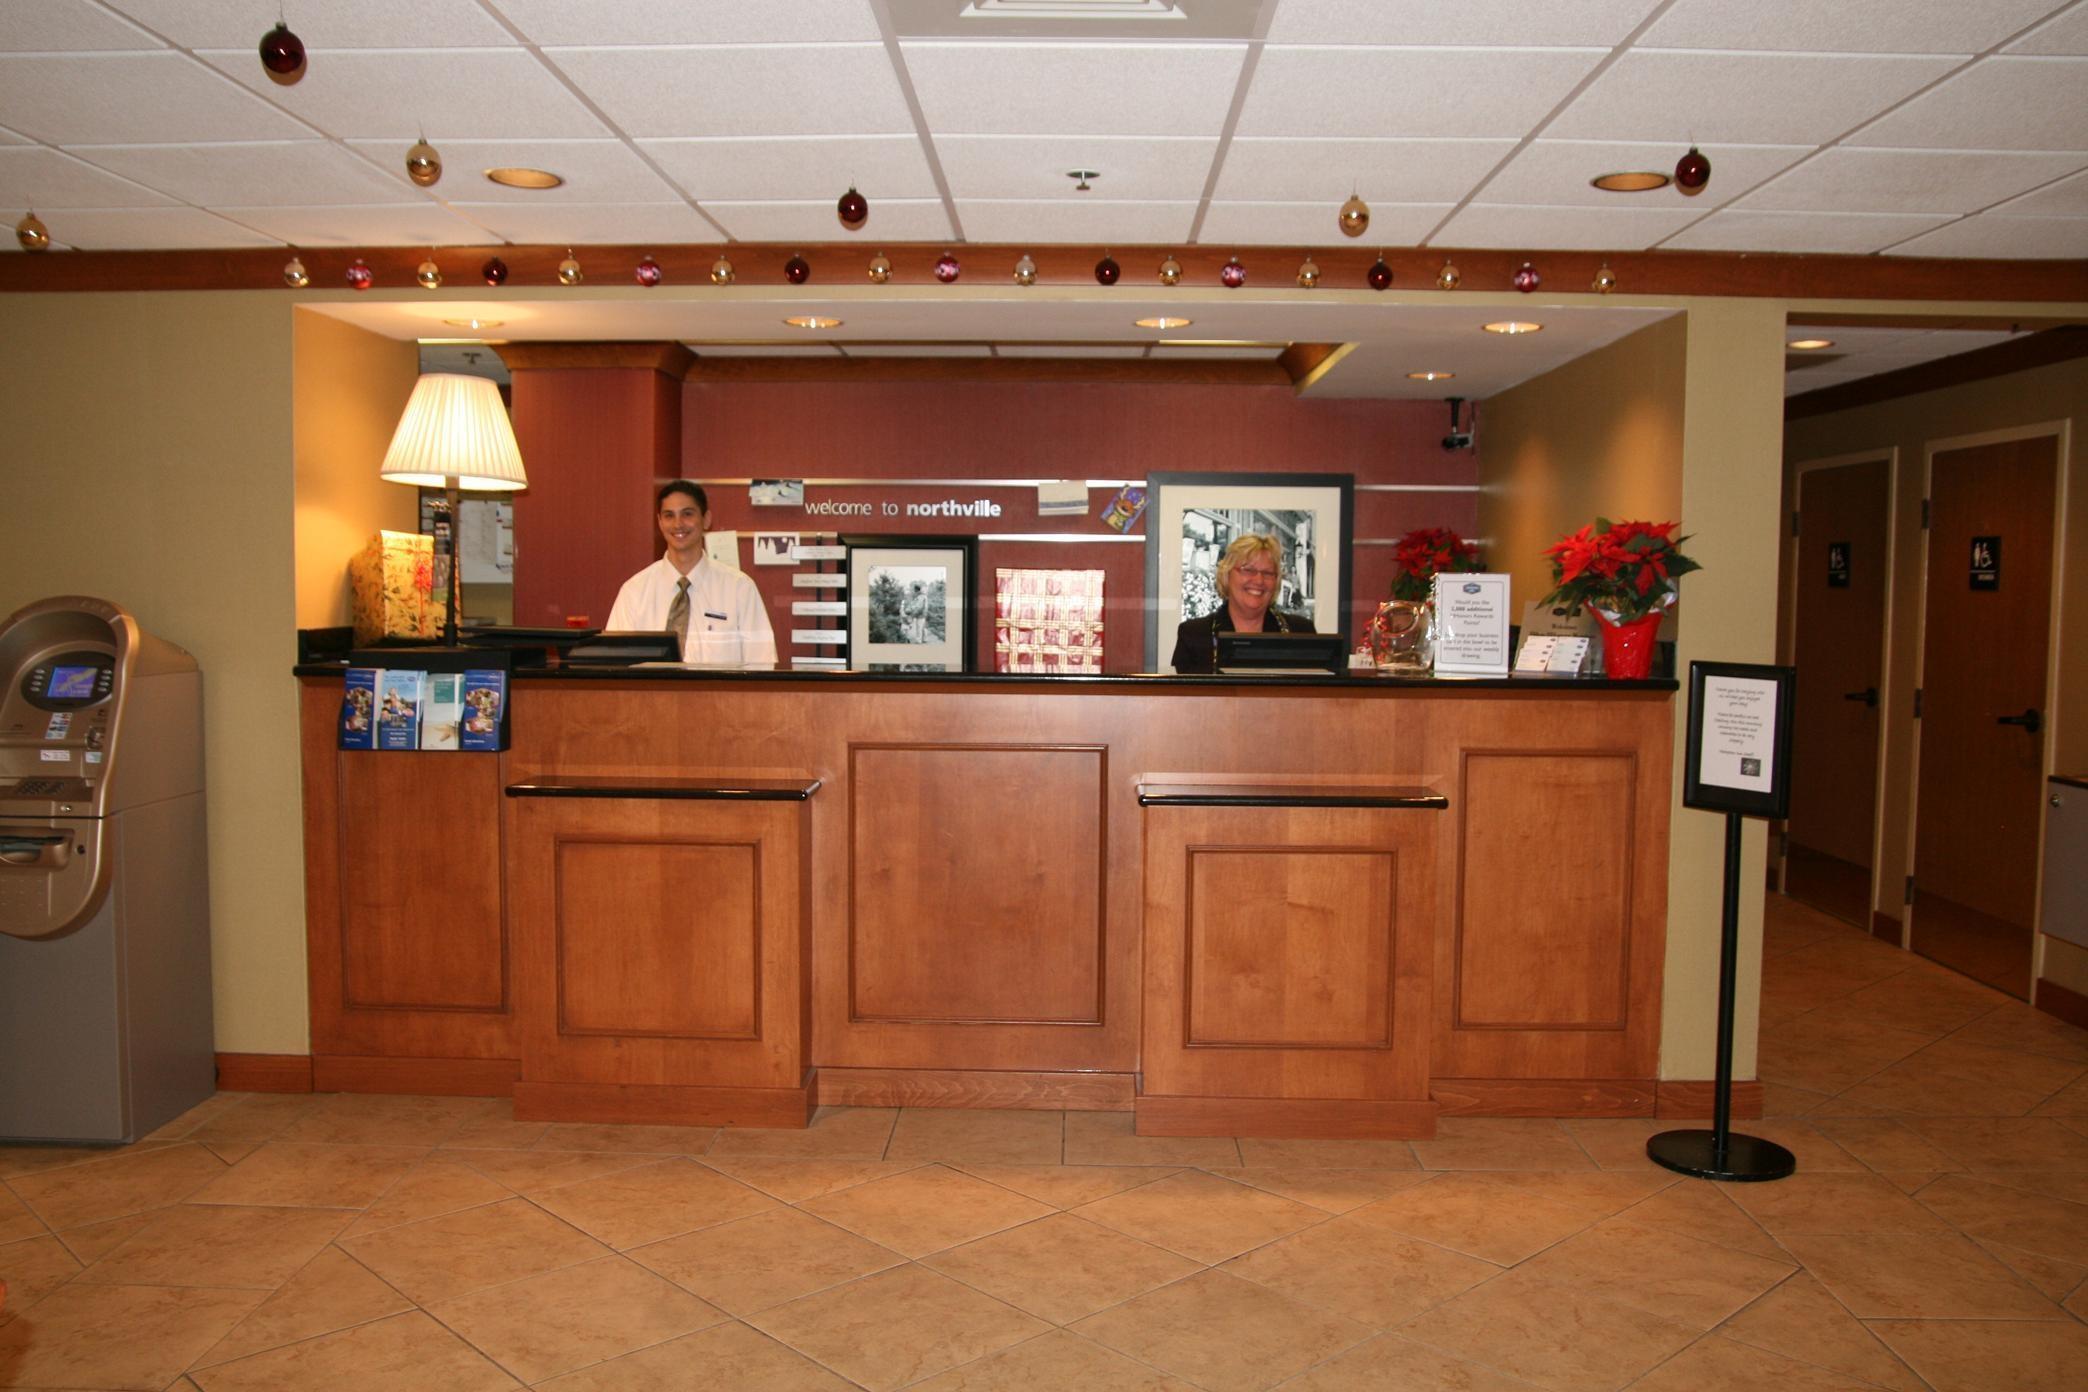 Hampton Inn Detroit/Northville image 3